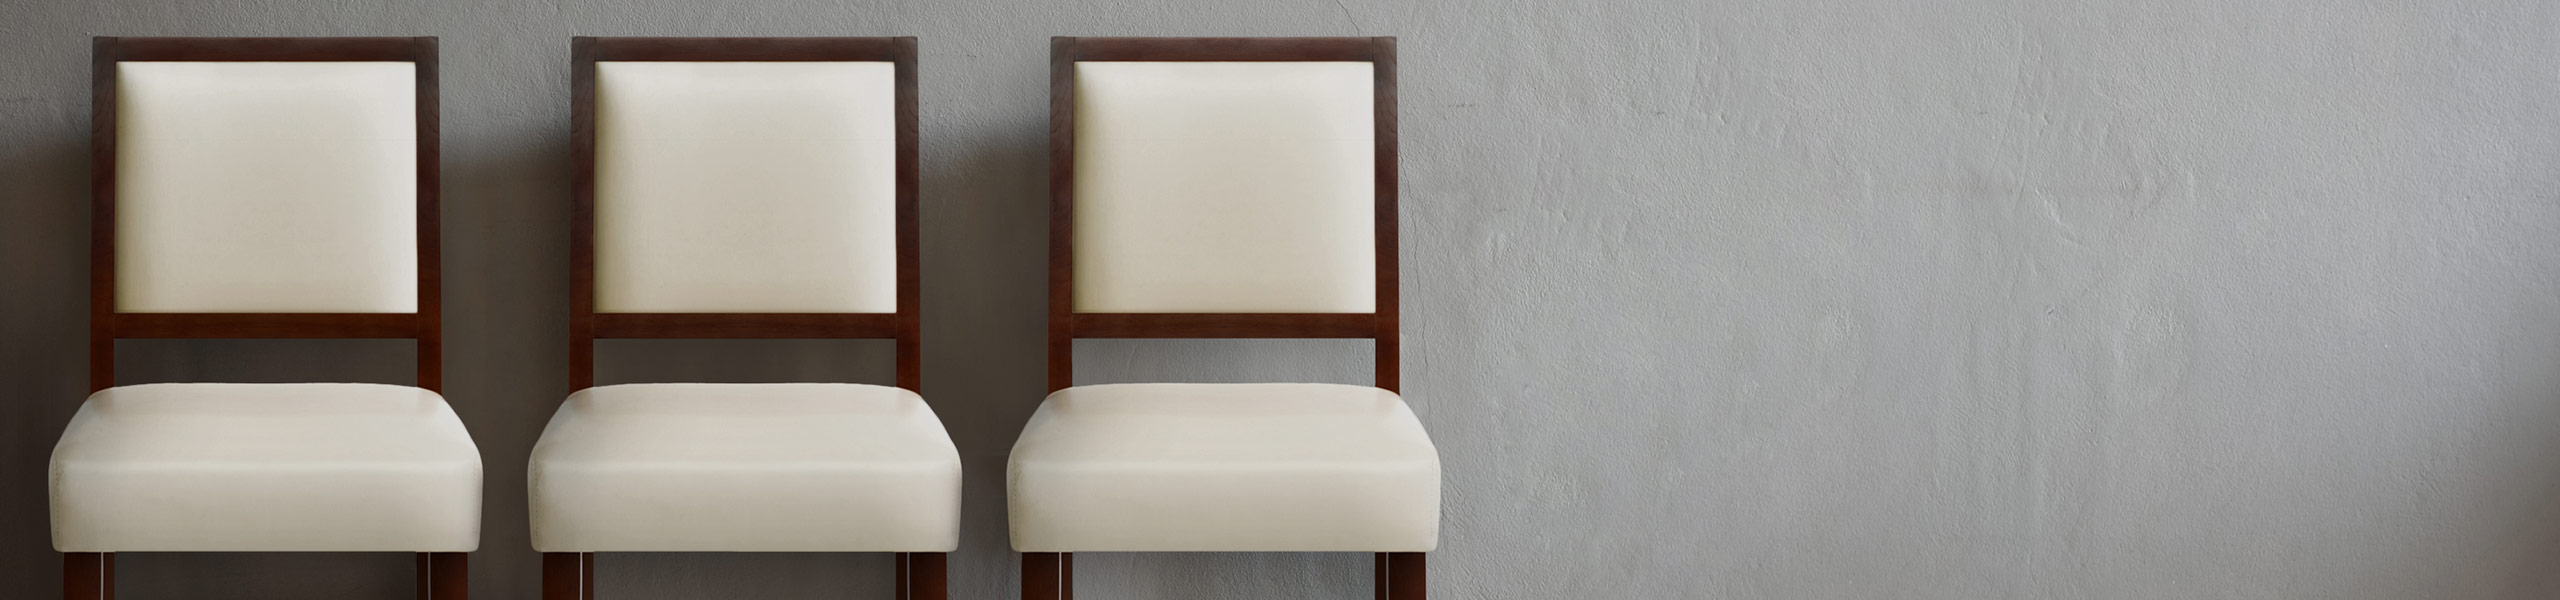 Astonishing Jasper Leather Bar Stool Walnut Cream Andrewgaddart Wooden Chair Designs For Living Room Andrewgaddartcom